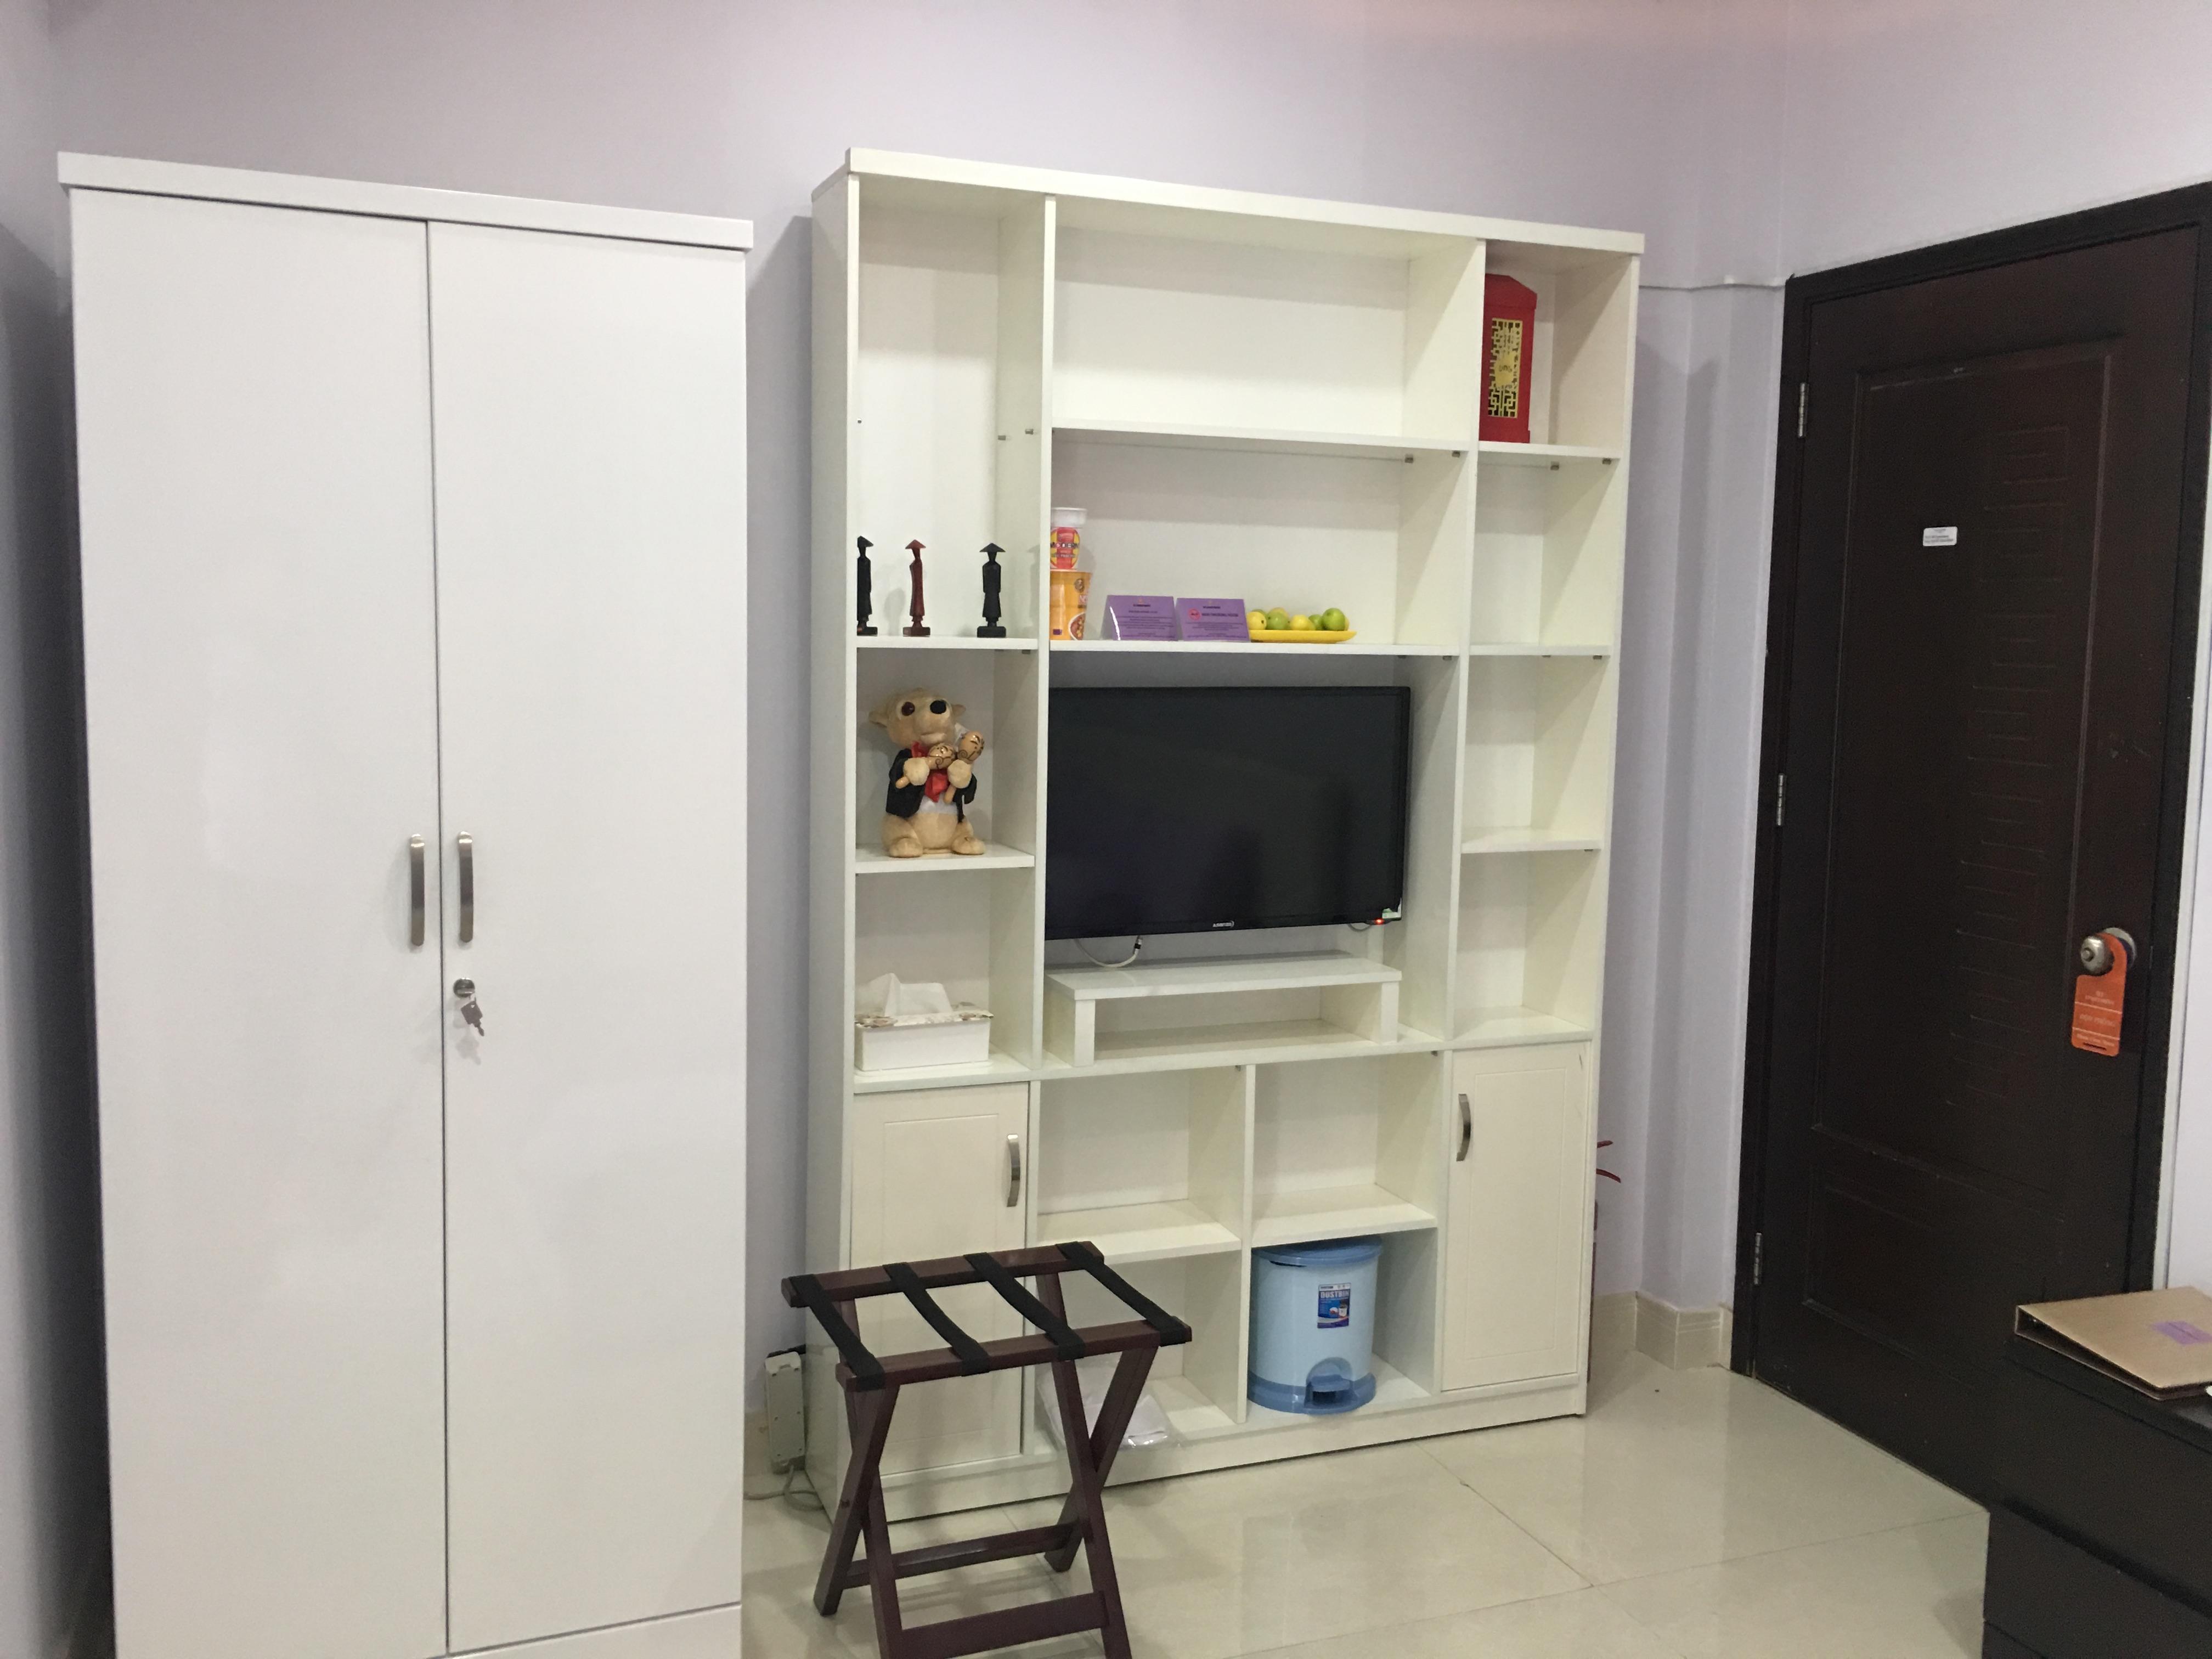 Standard Room 3301